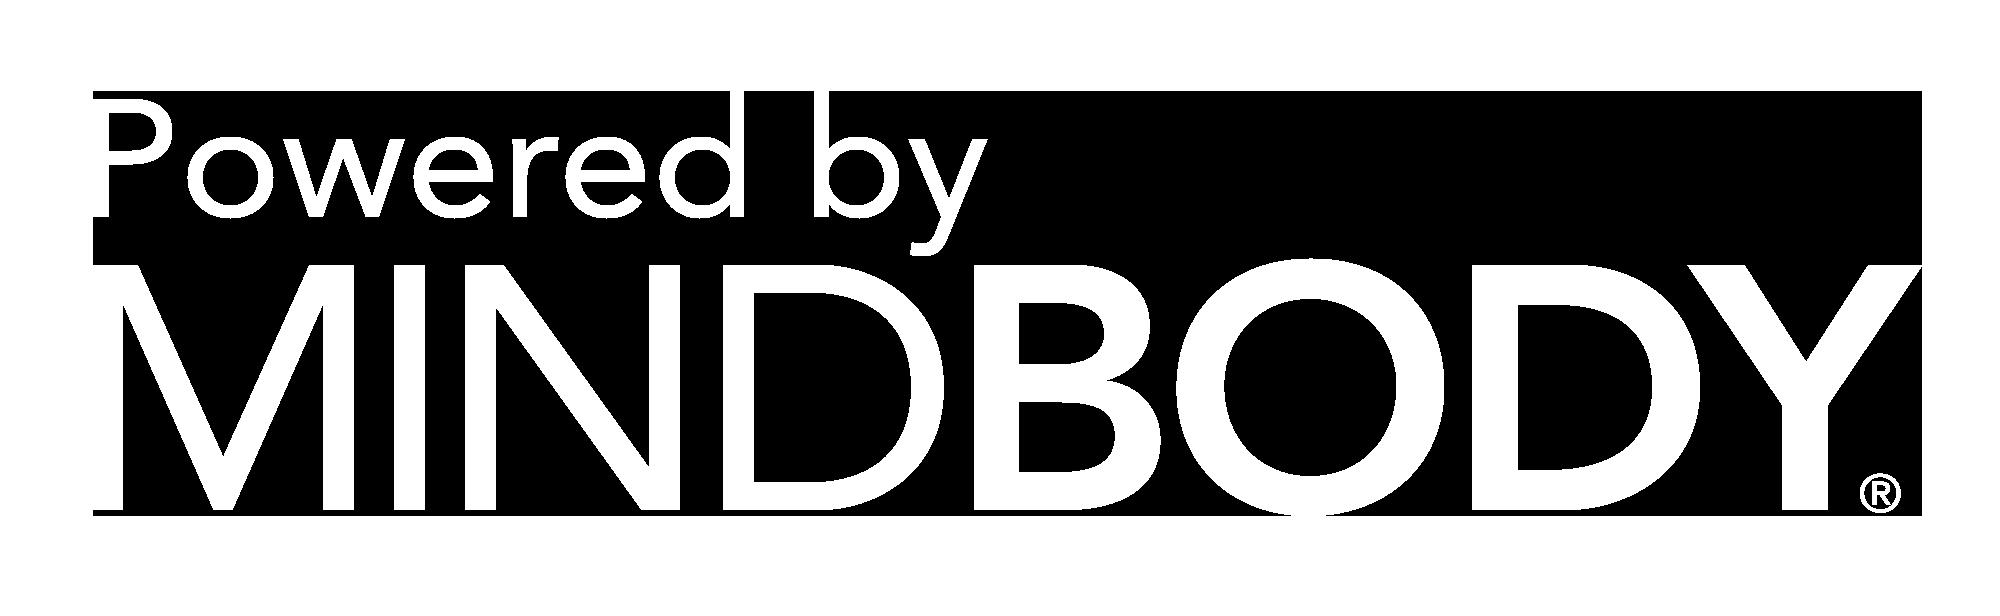 Powered by MINDBODY